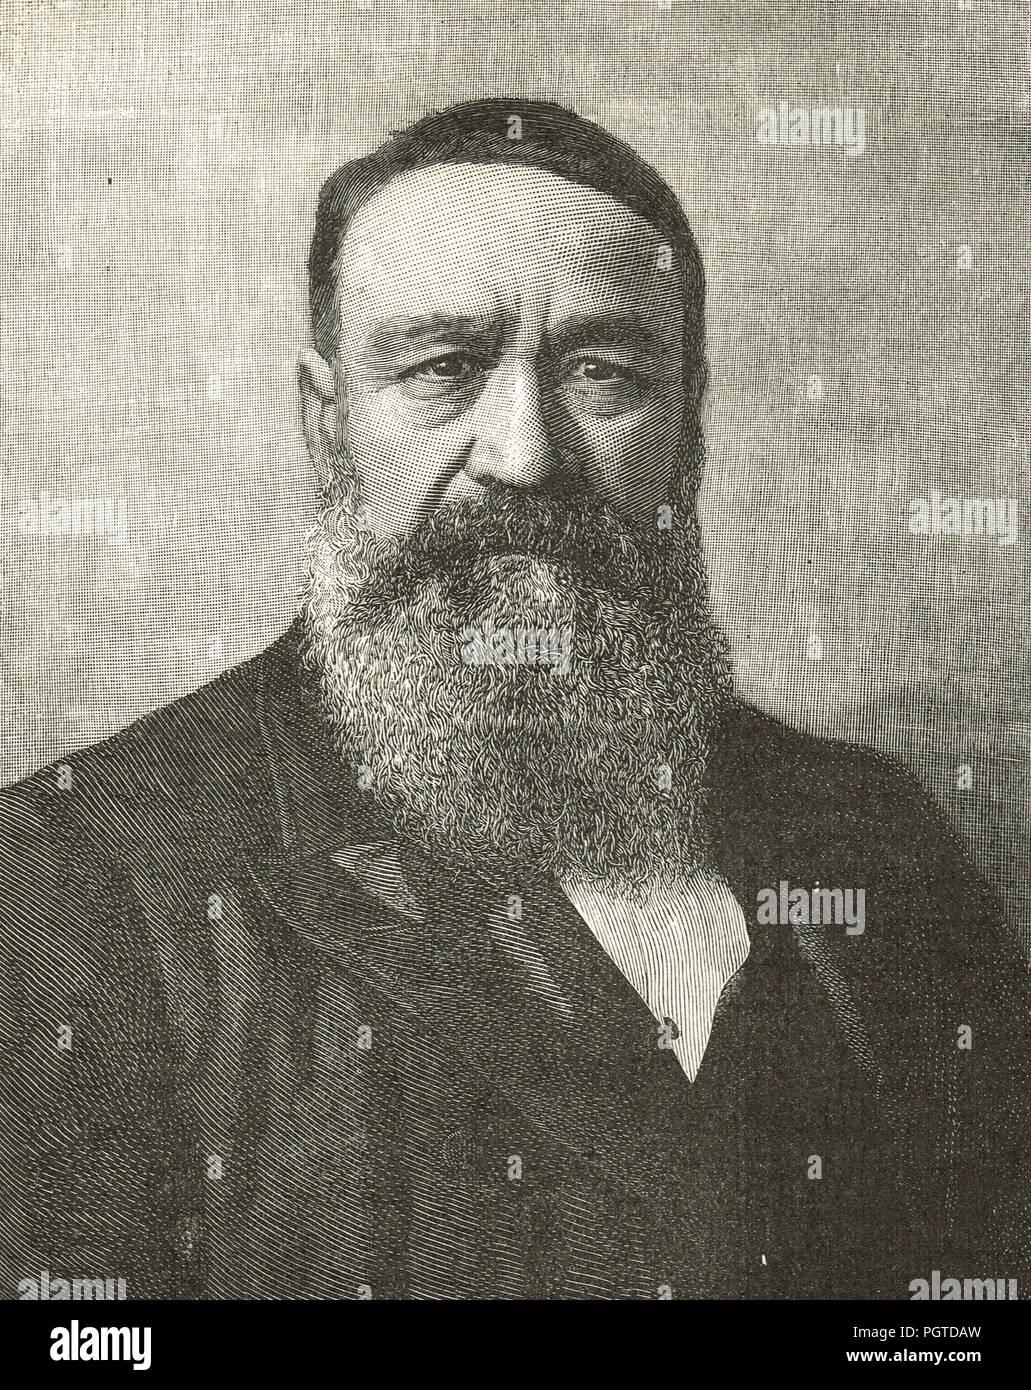 Petrus Jacobus Joubert, mejor conocido como Piet Joubert, Commandant-General de la República de Sudáfrica desde 1880 a 1900 Foto de stock